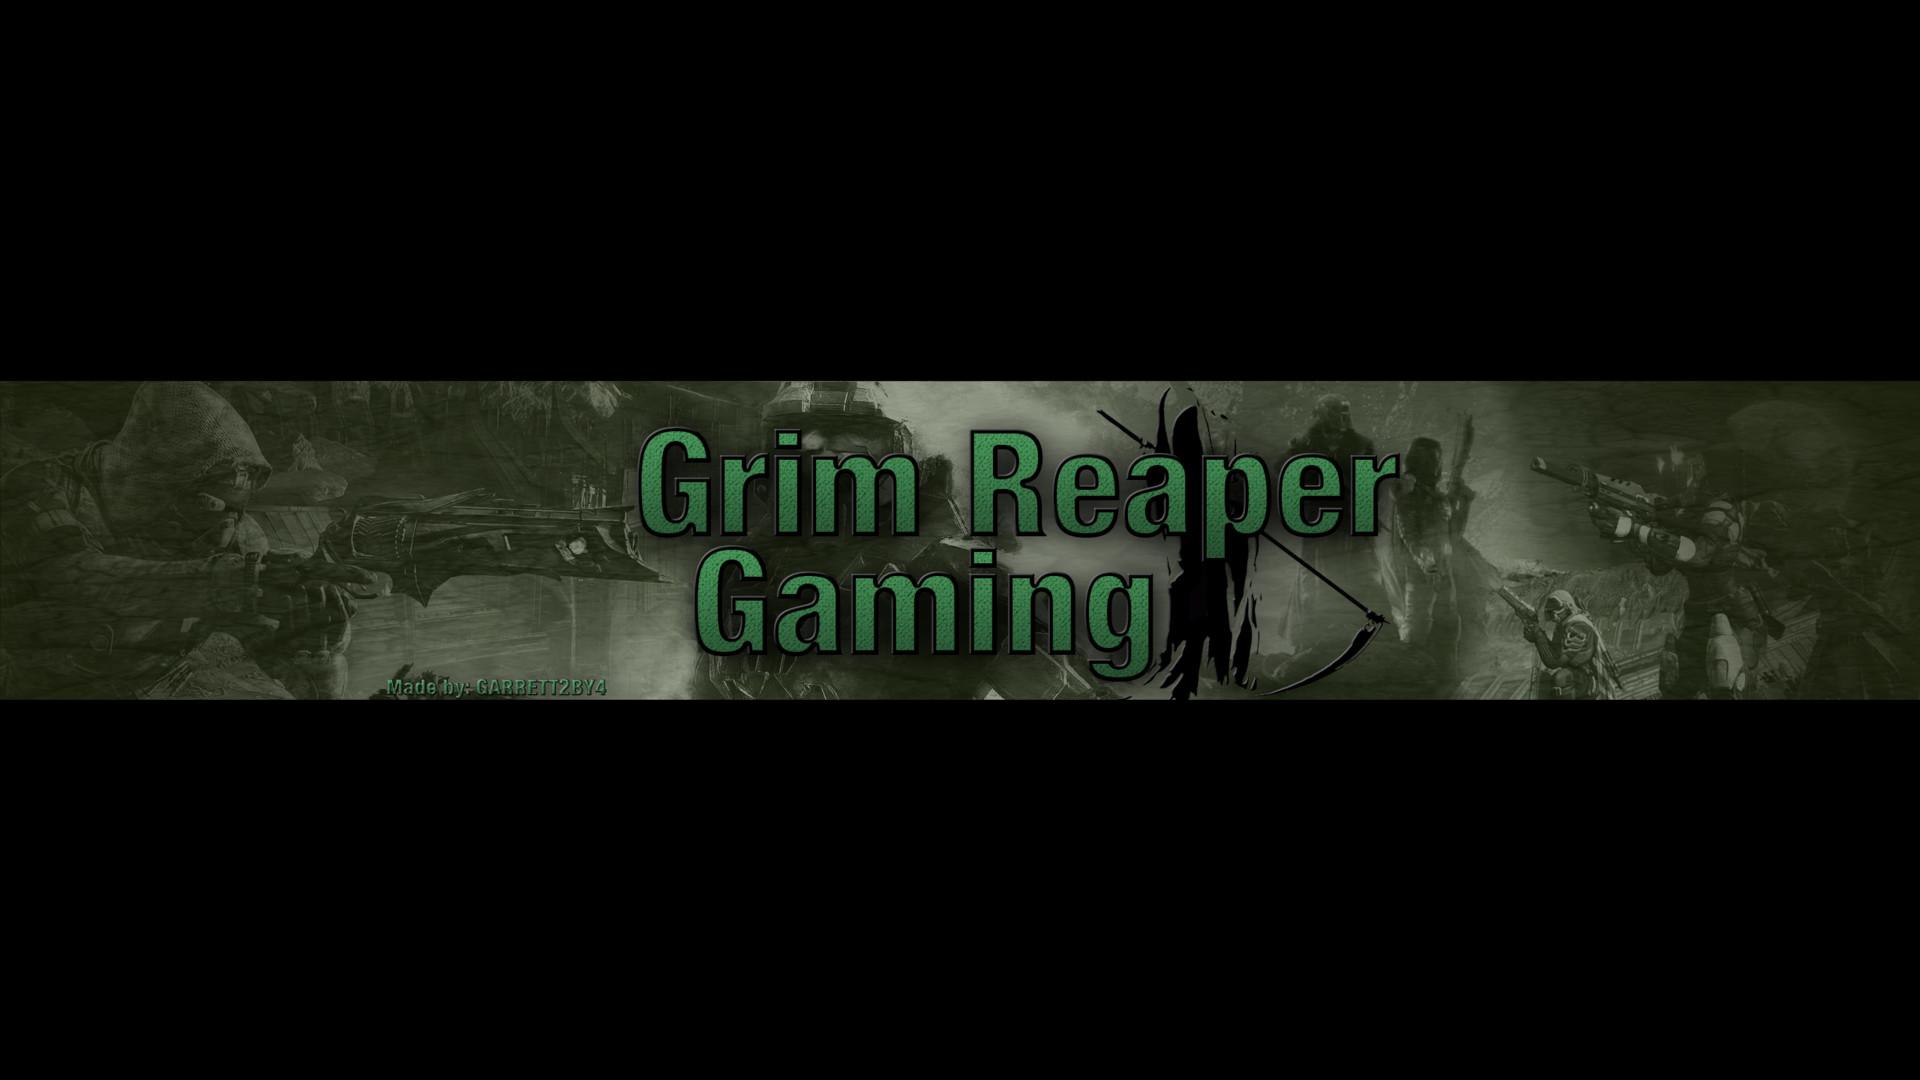 ArtStation - YouTube Channel Art: Grim Reaper Gaming